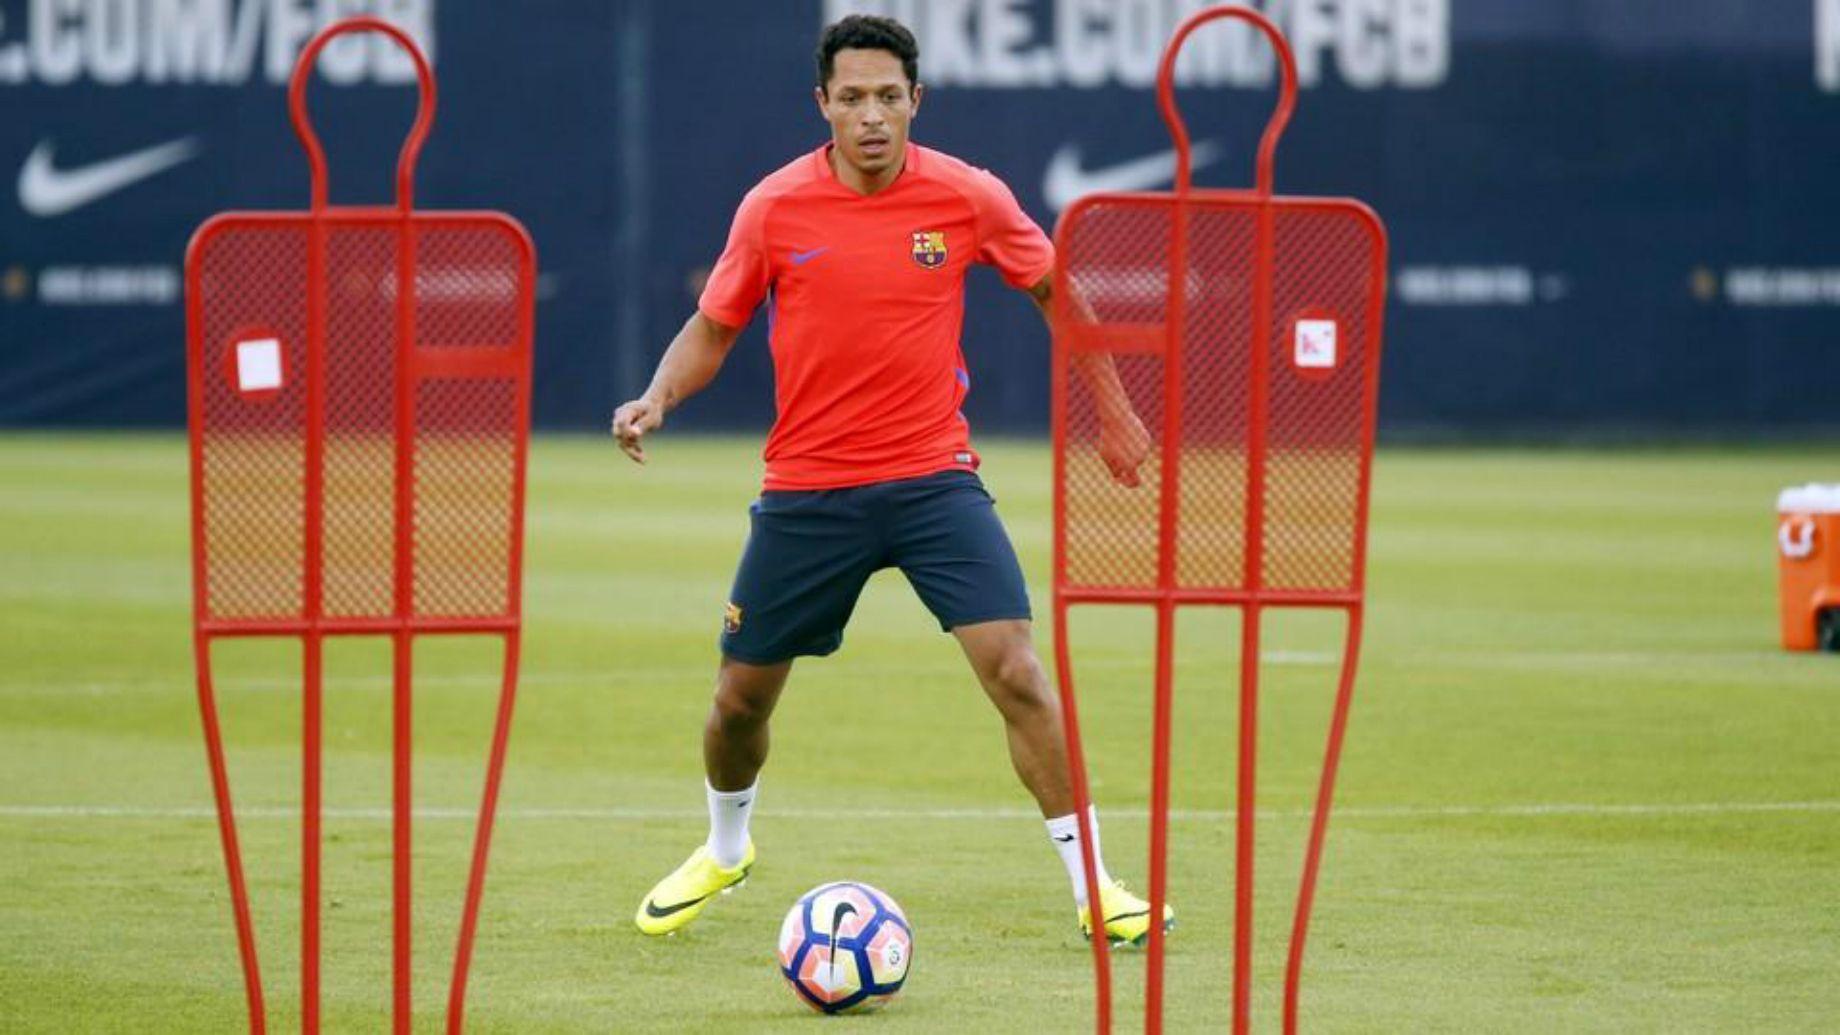 Adriano Correia entrenament 2016 - FCB